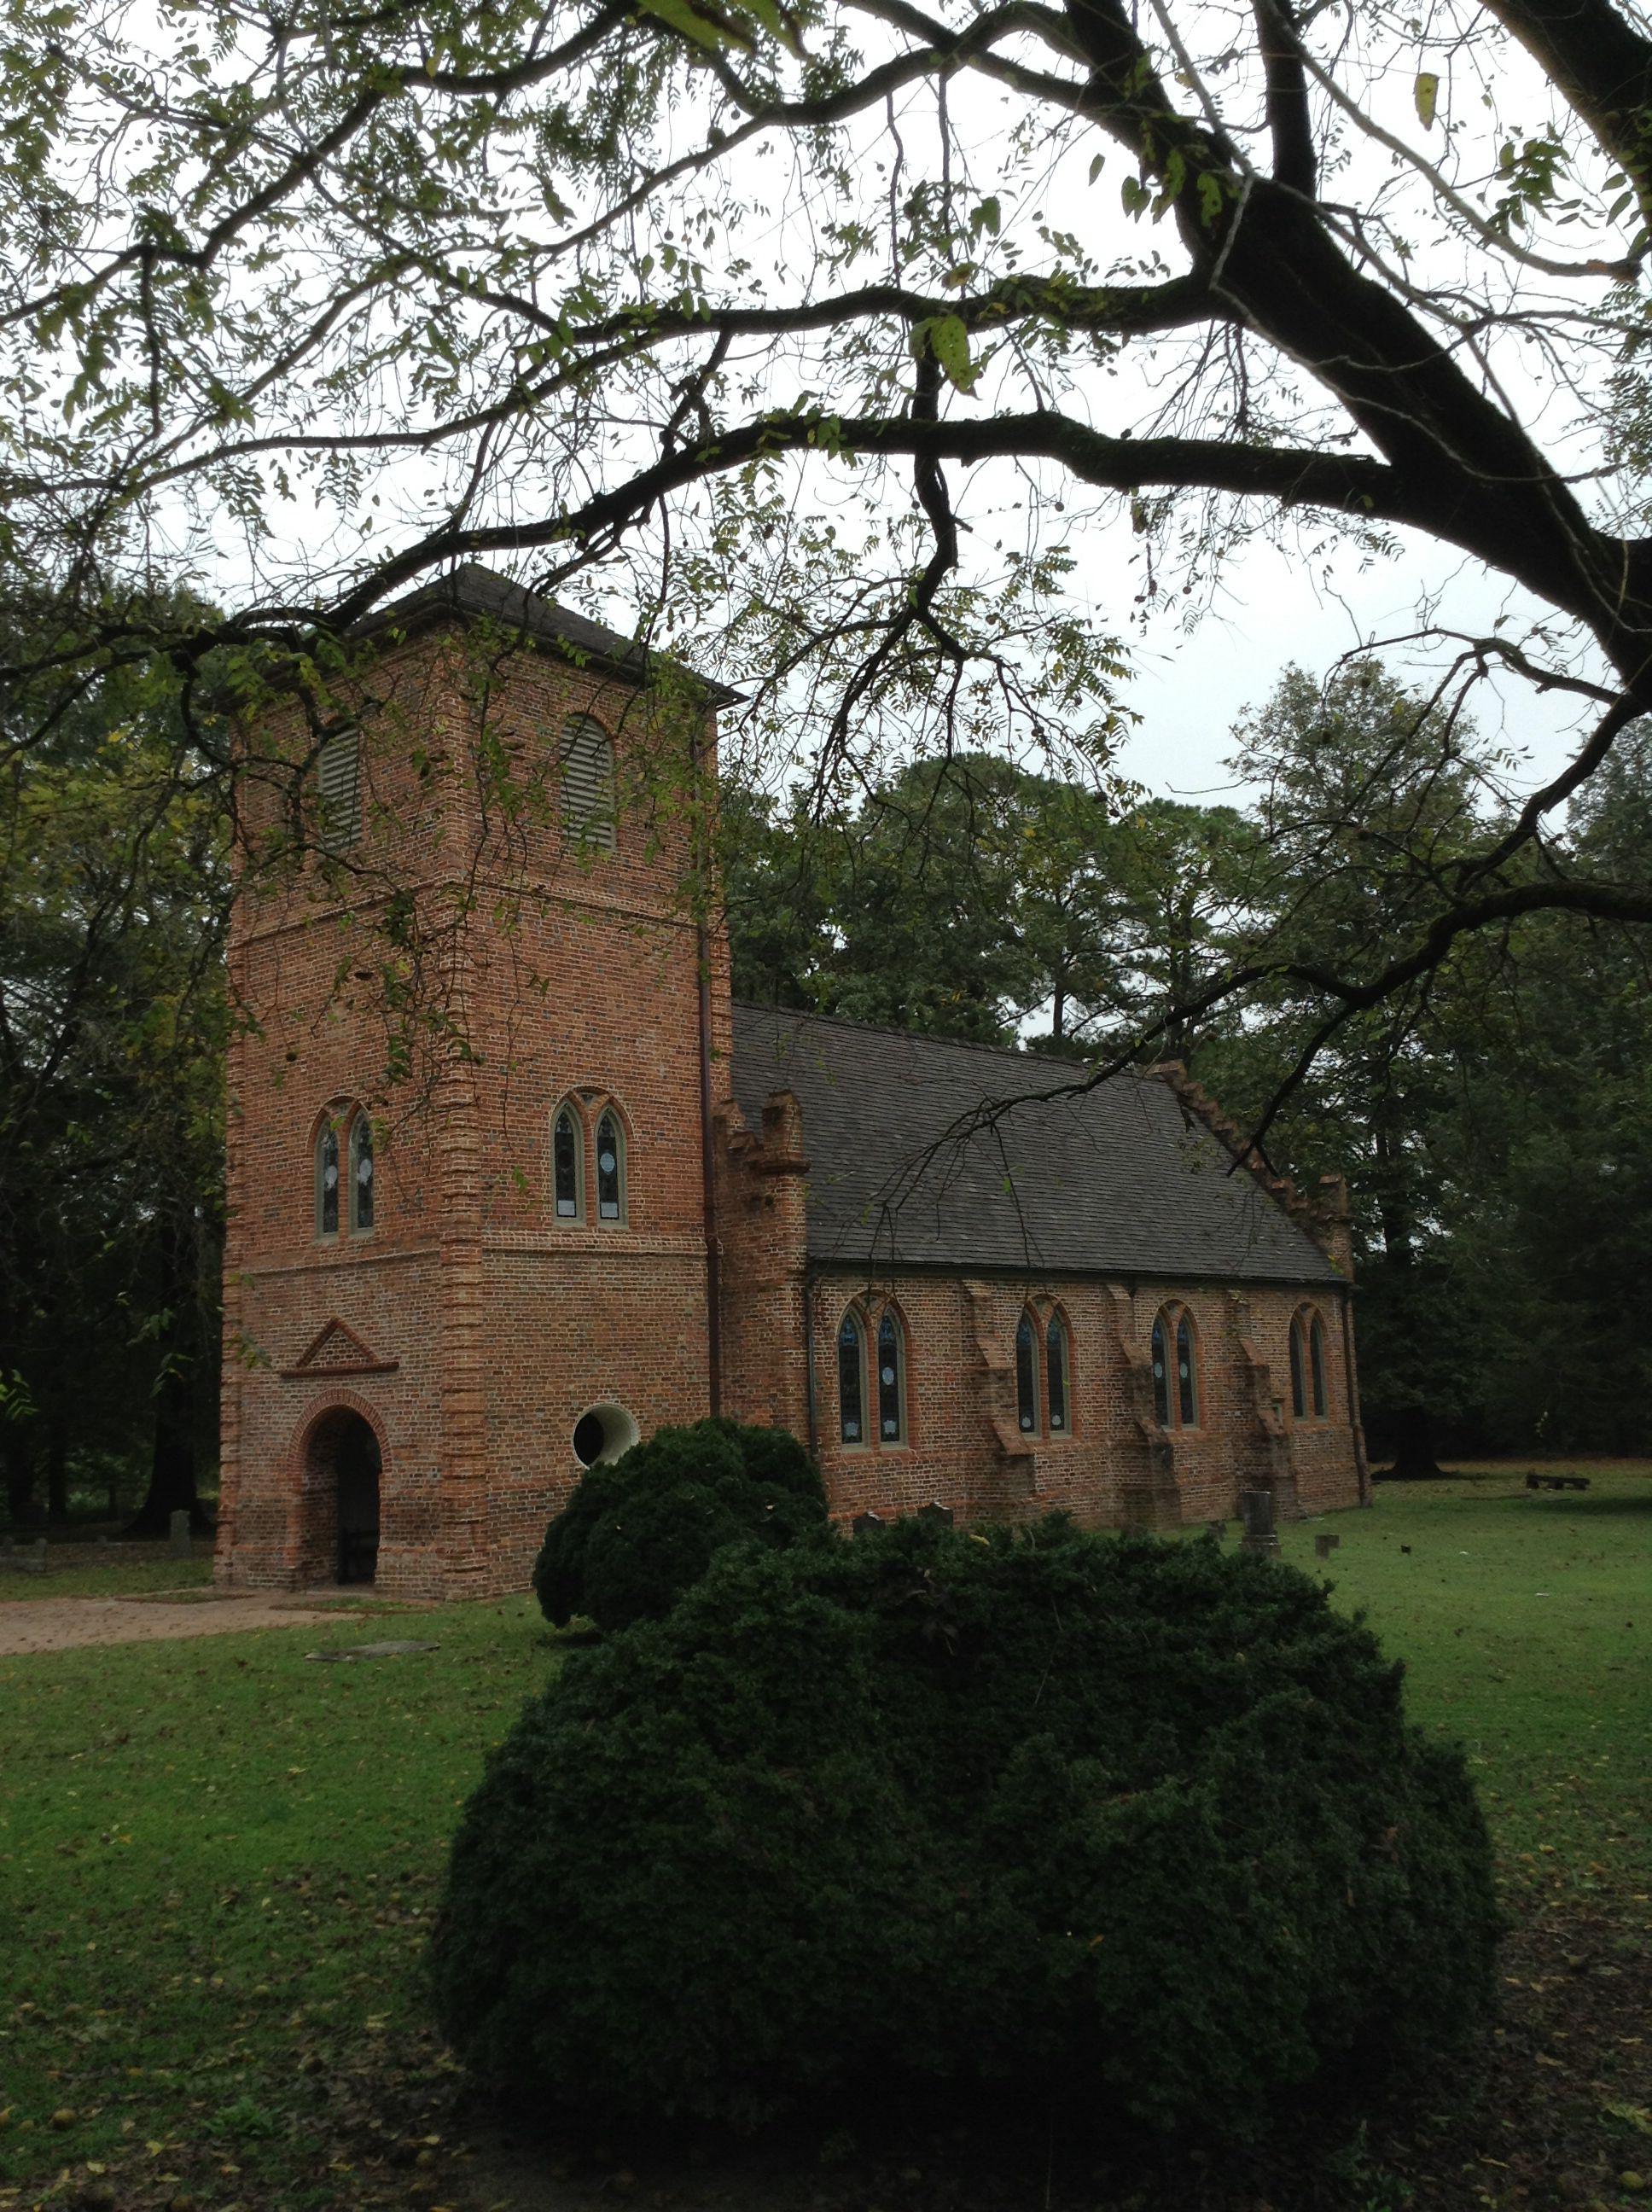 St. Luke's historical church in Smithfield , VA Near the